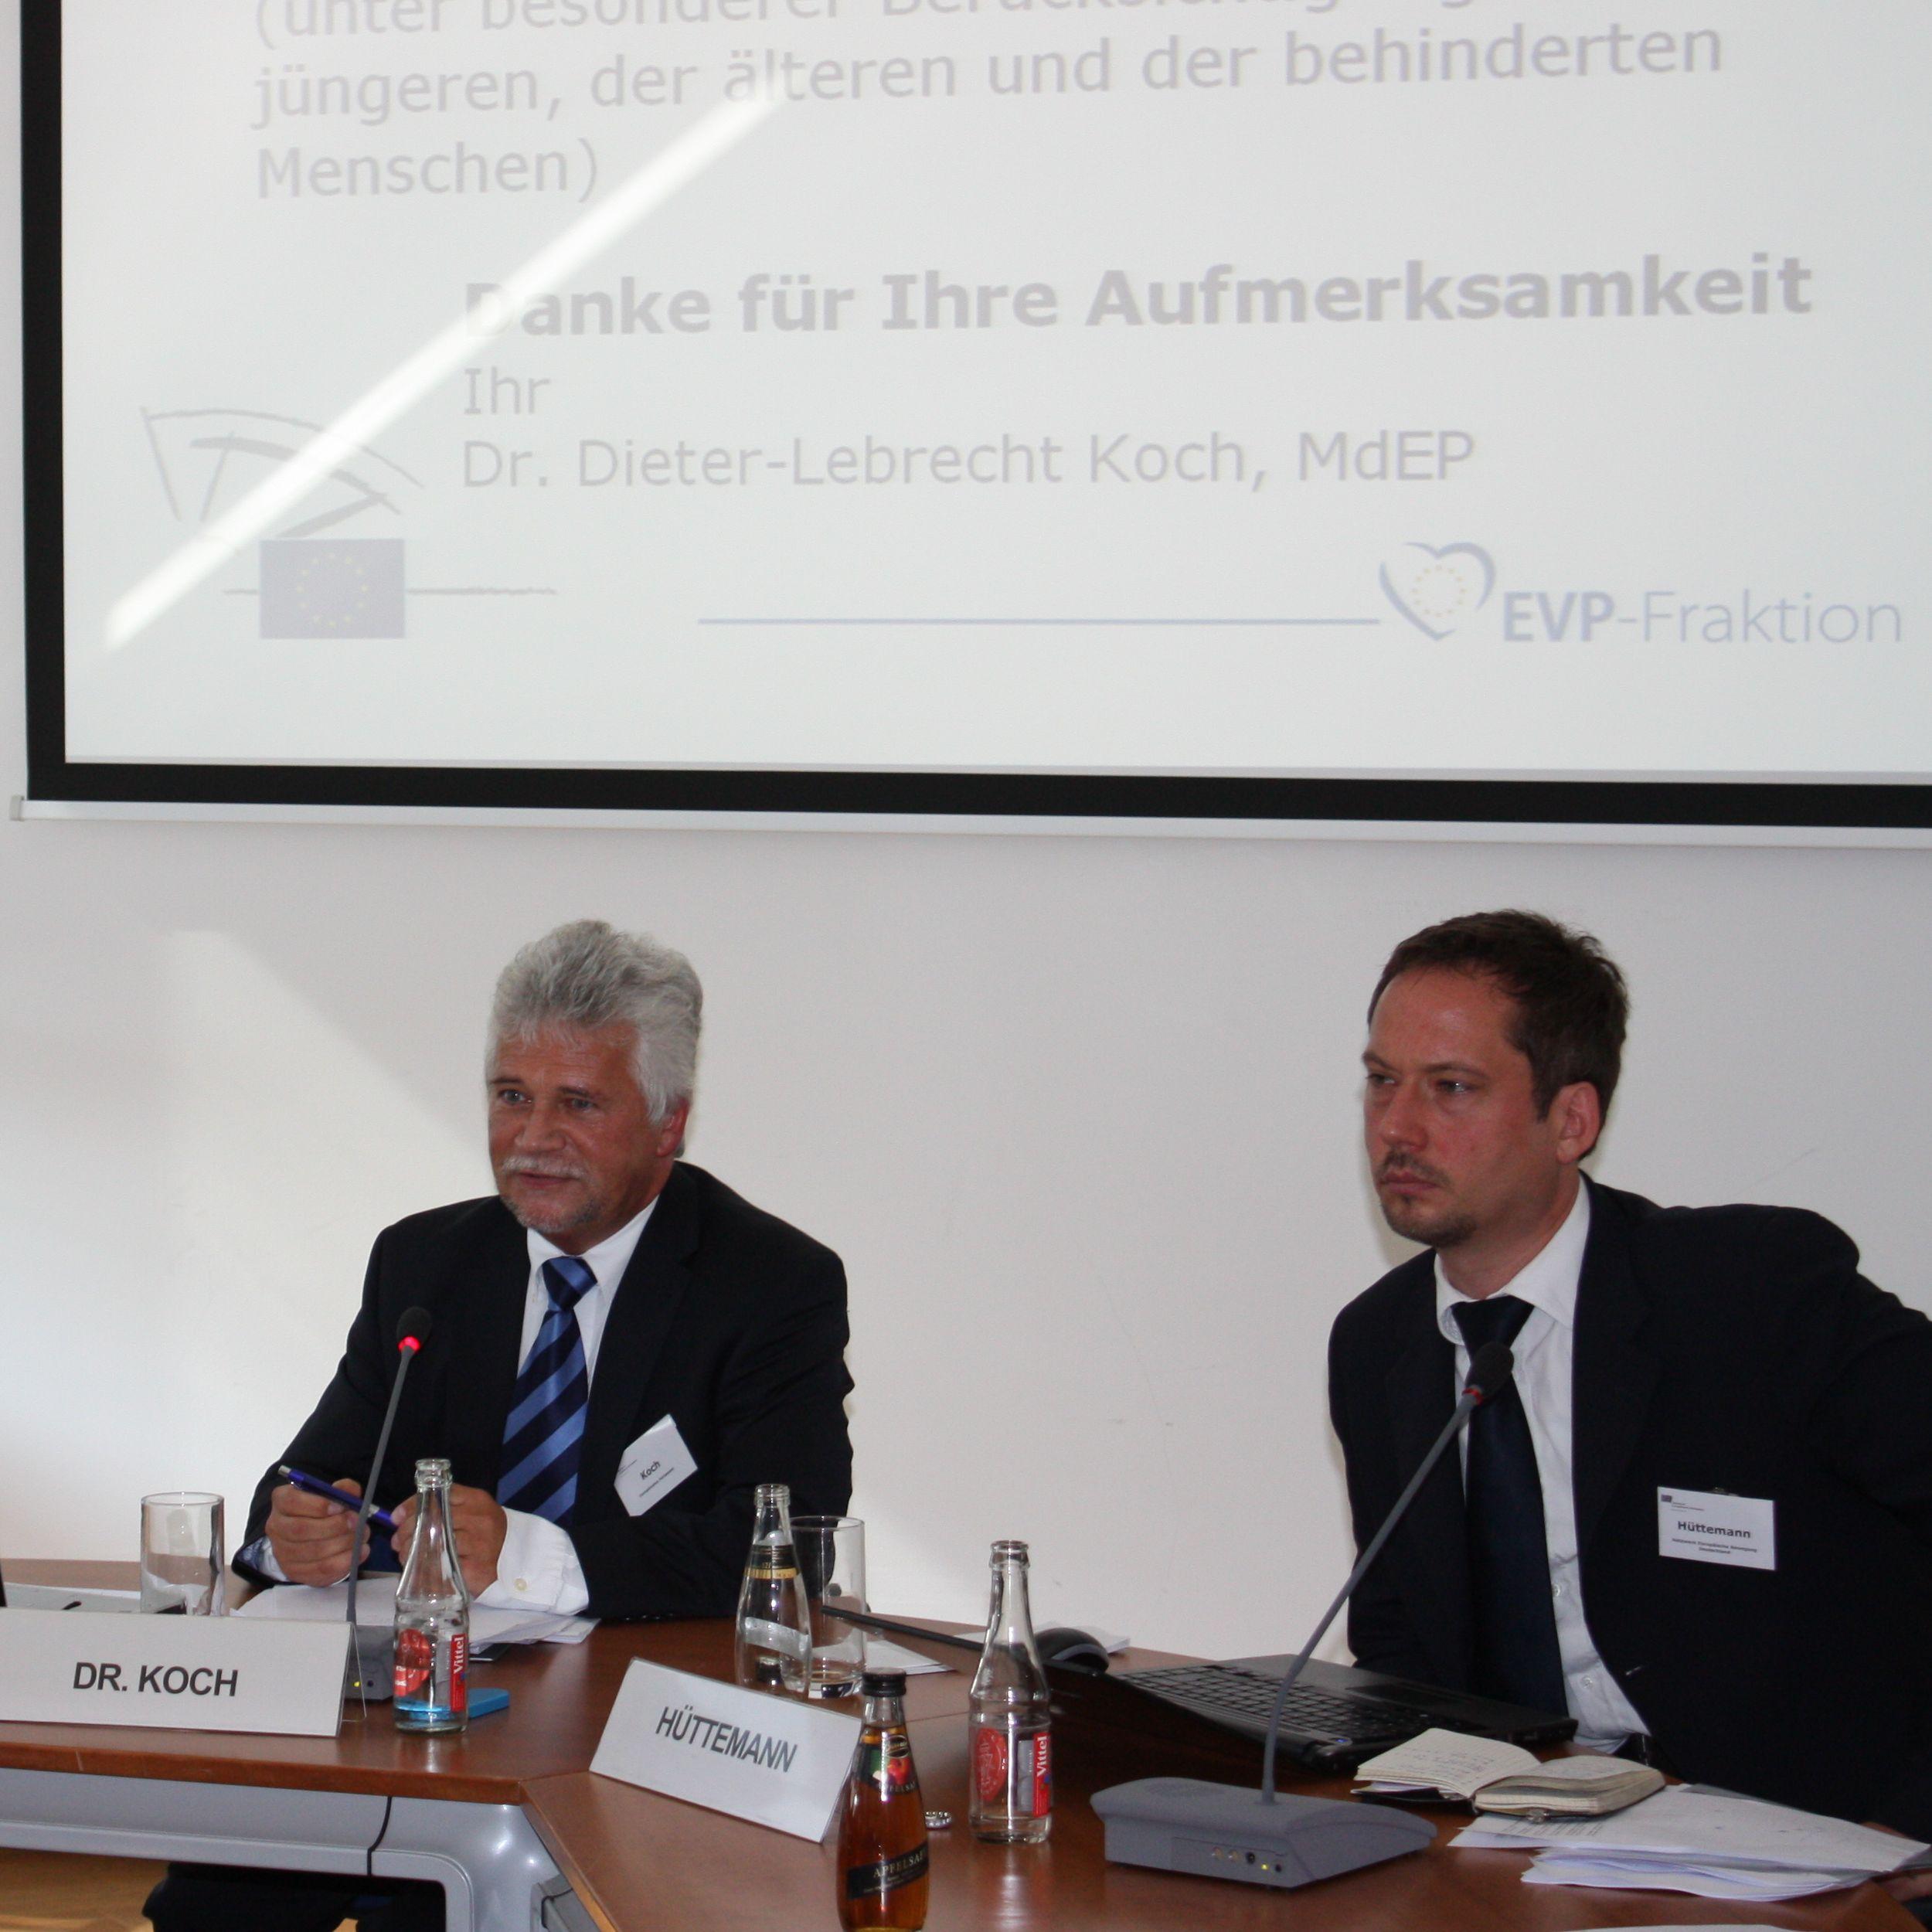 EP-Berichterstatter im Dialog: Straßenverkehrssicherheit – Europäisches Parlament drängt Kommission zu neuen Initiativen